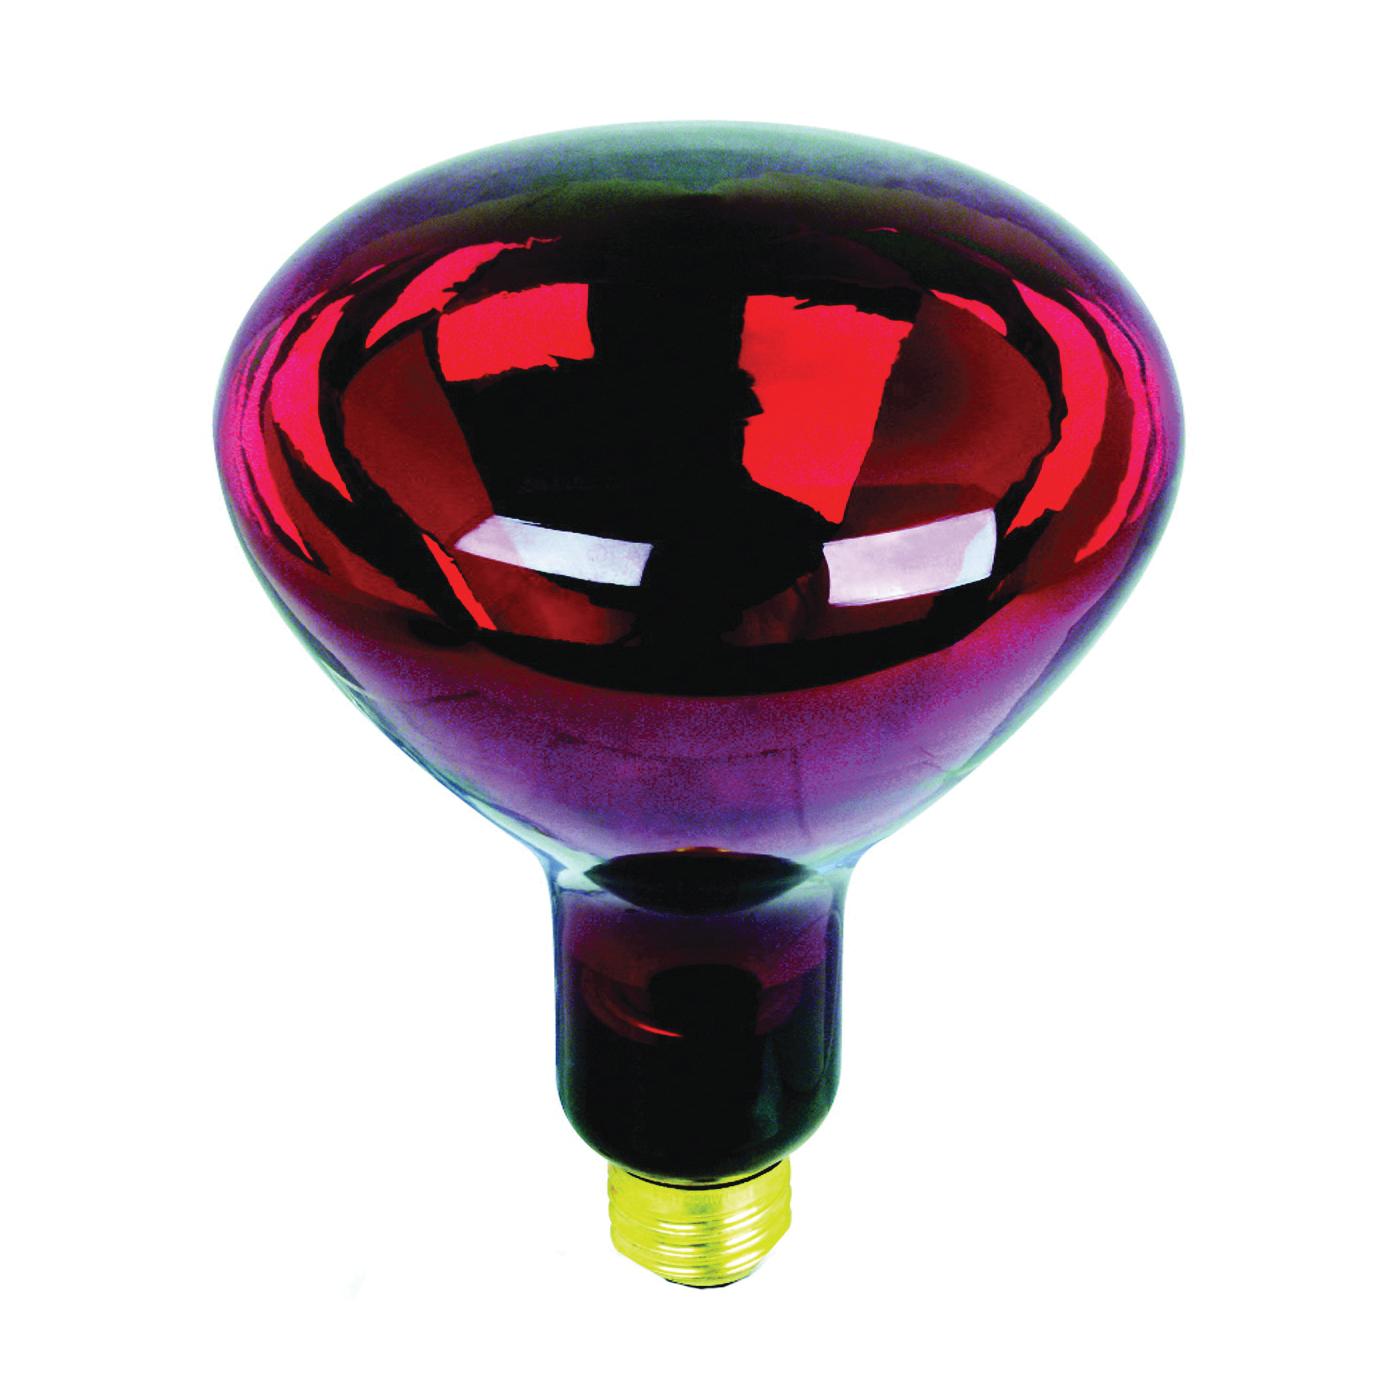 Picture of Feit Electric 250R40/R/2 Incandescent Lamp, 250 W, R40 Lamp, Medium E26 Lamp Base, 2700 K Color Temp